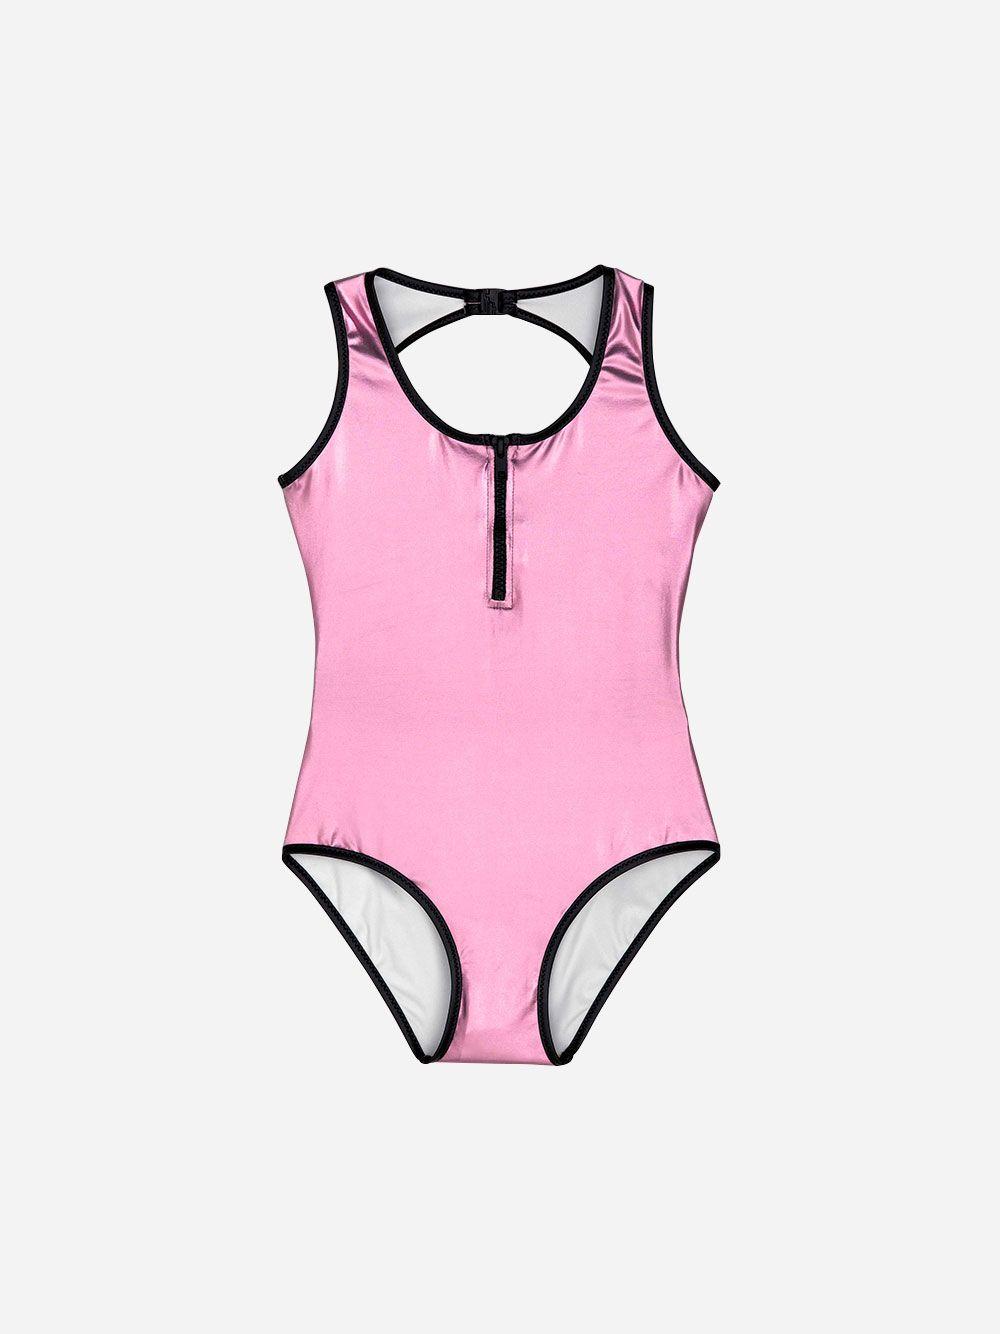 Zipped Pink Metallic Swimsuit | Andorine